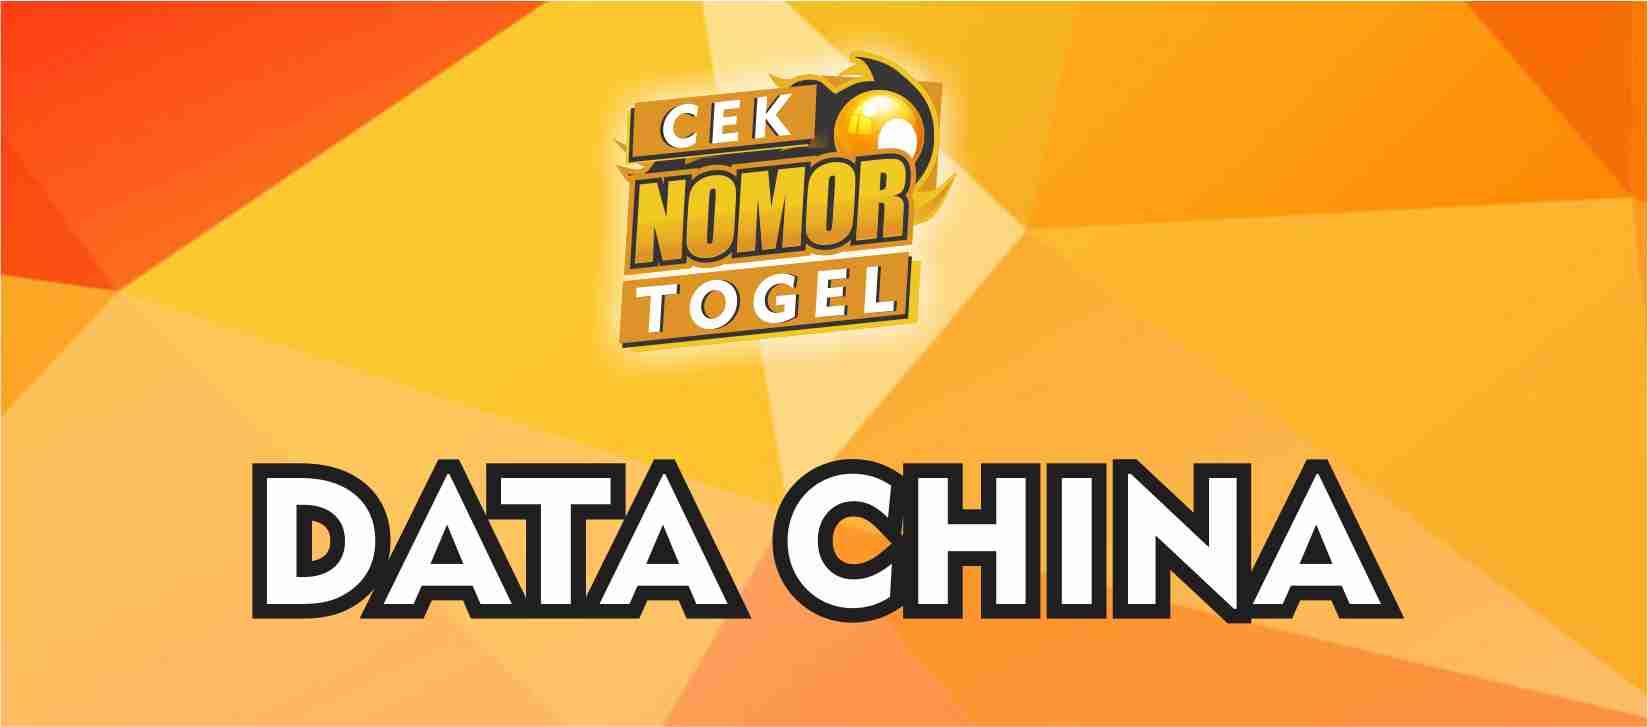 Pengeluaran china pools hari ini, data china 2021, keluaran china tercepat, live result china, live draw china terupdate, data result china